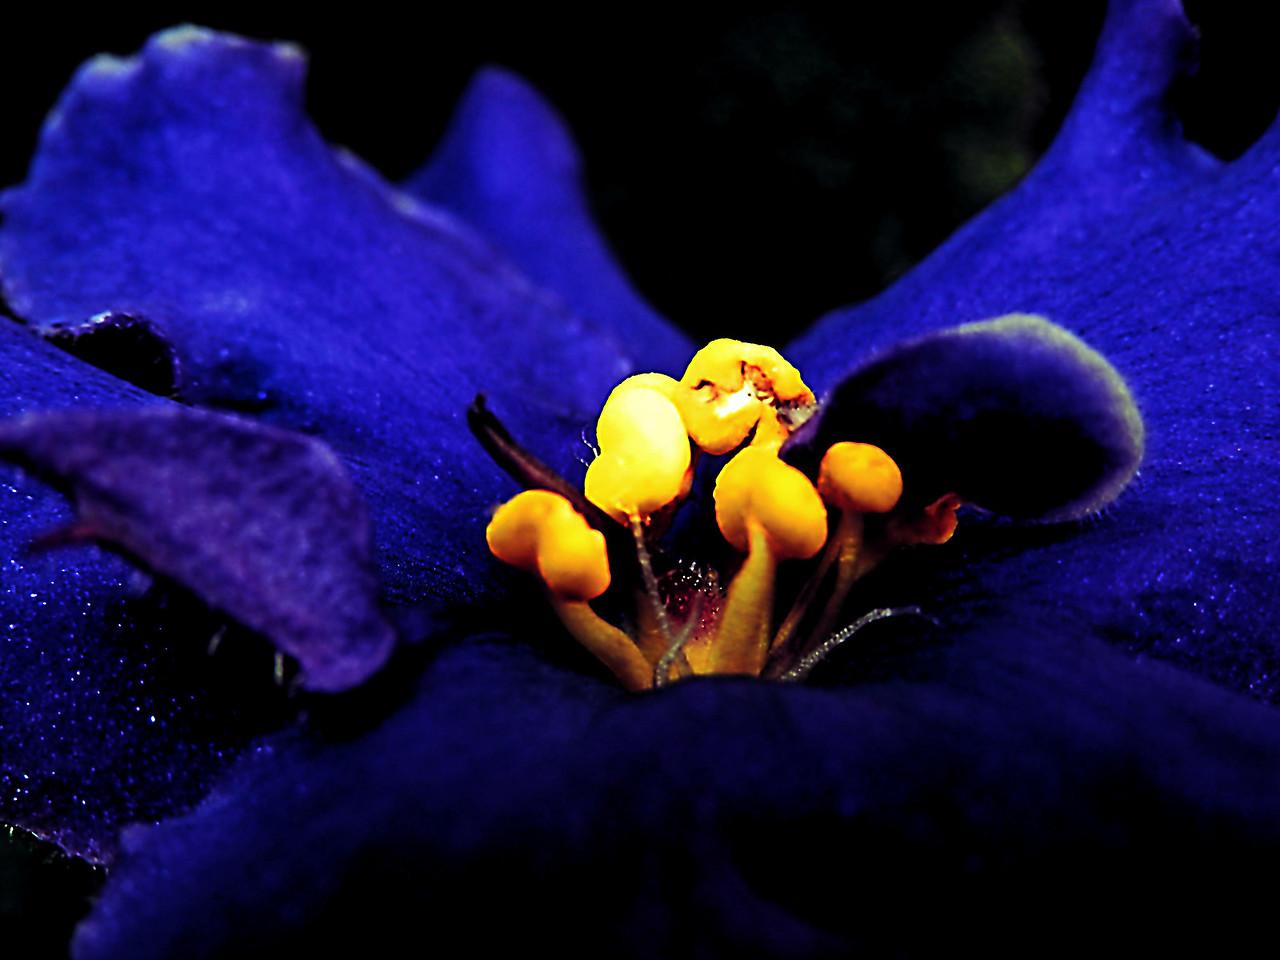 African violet bloom macro in a dramatic edit.